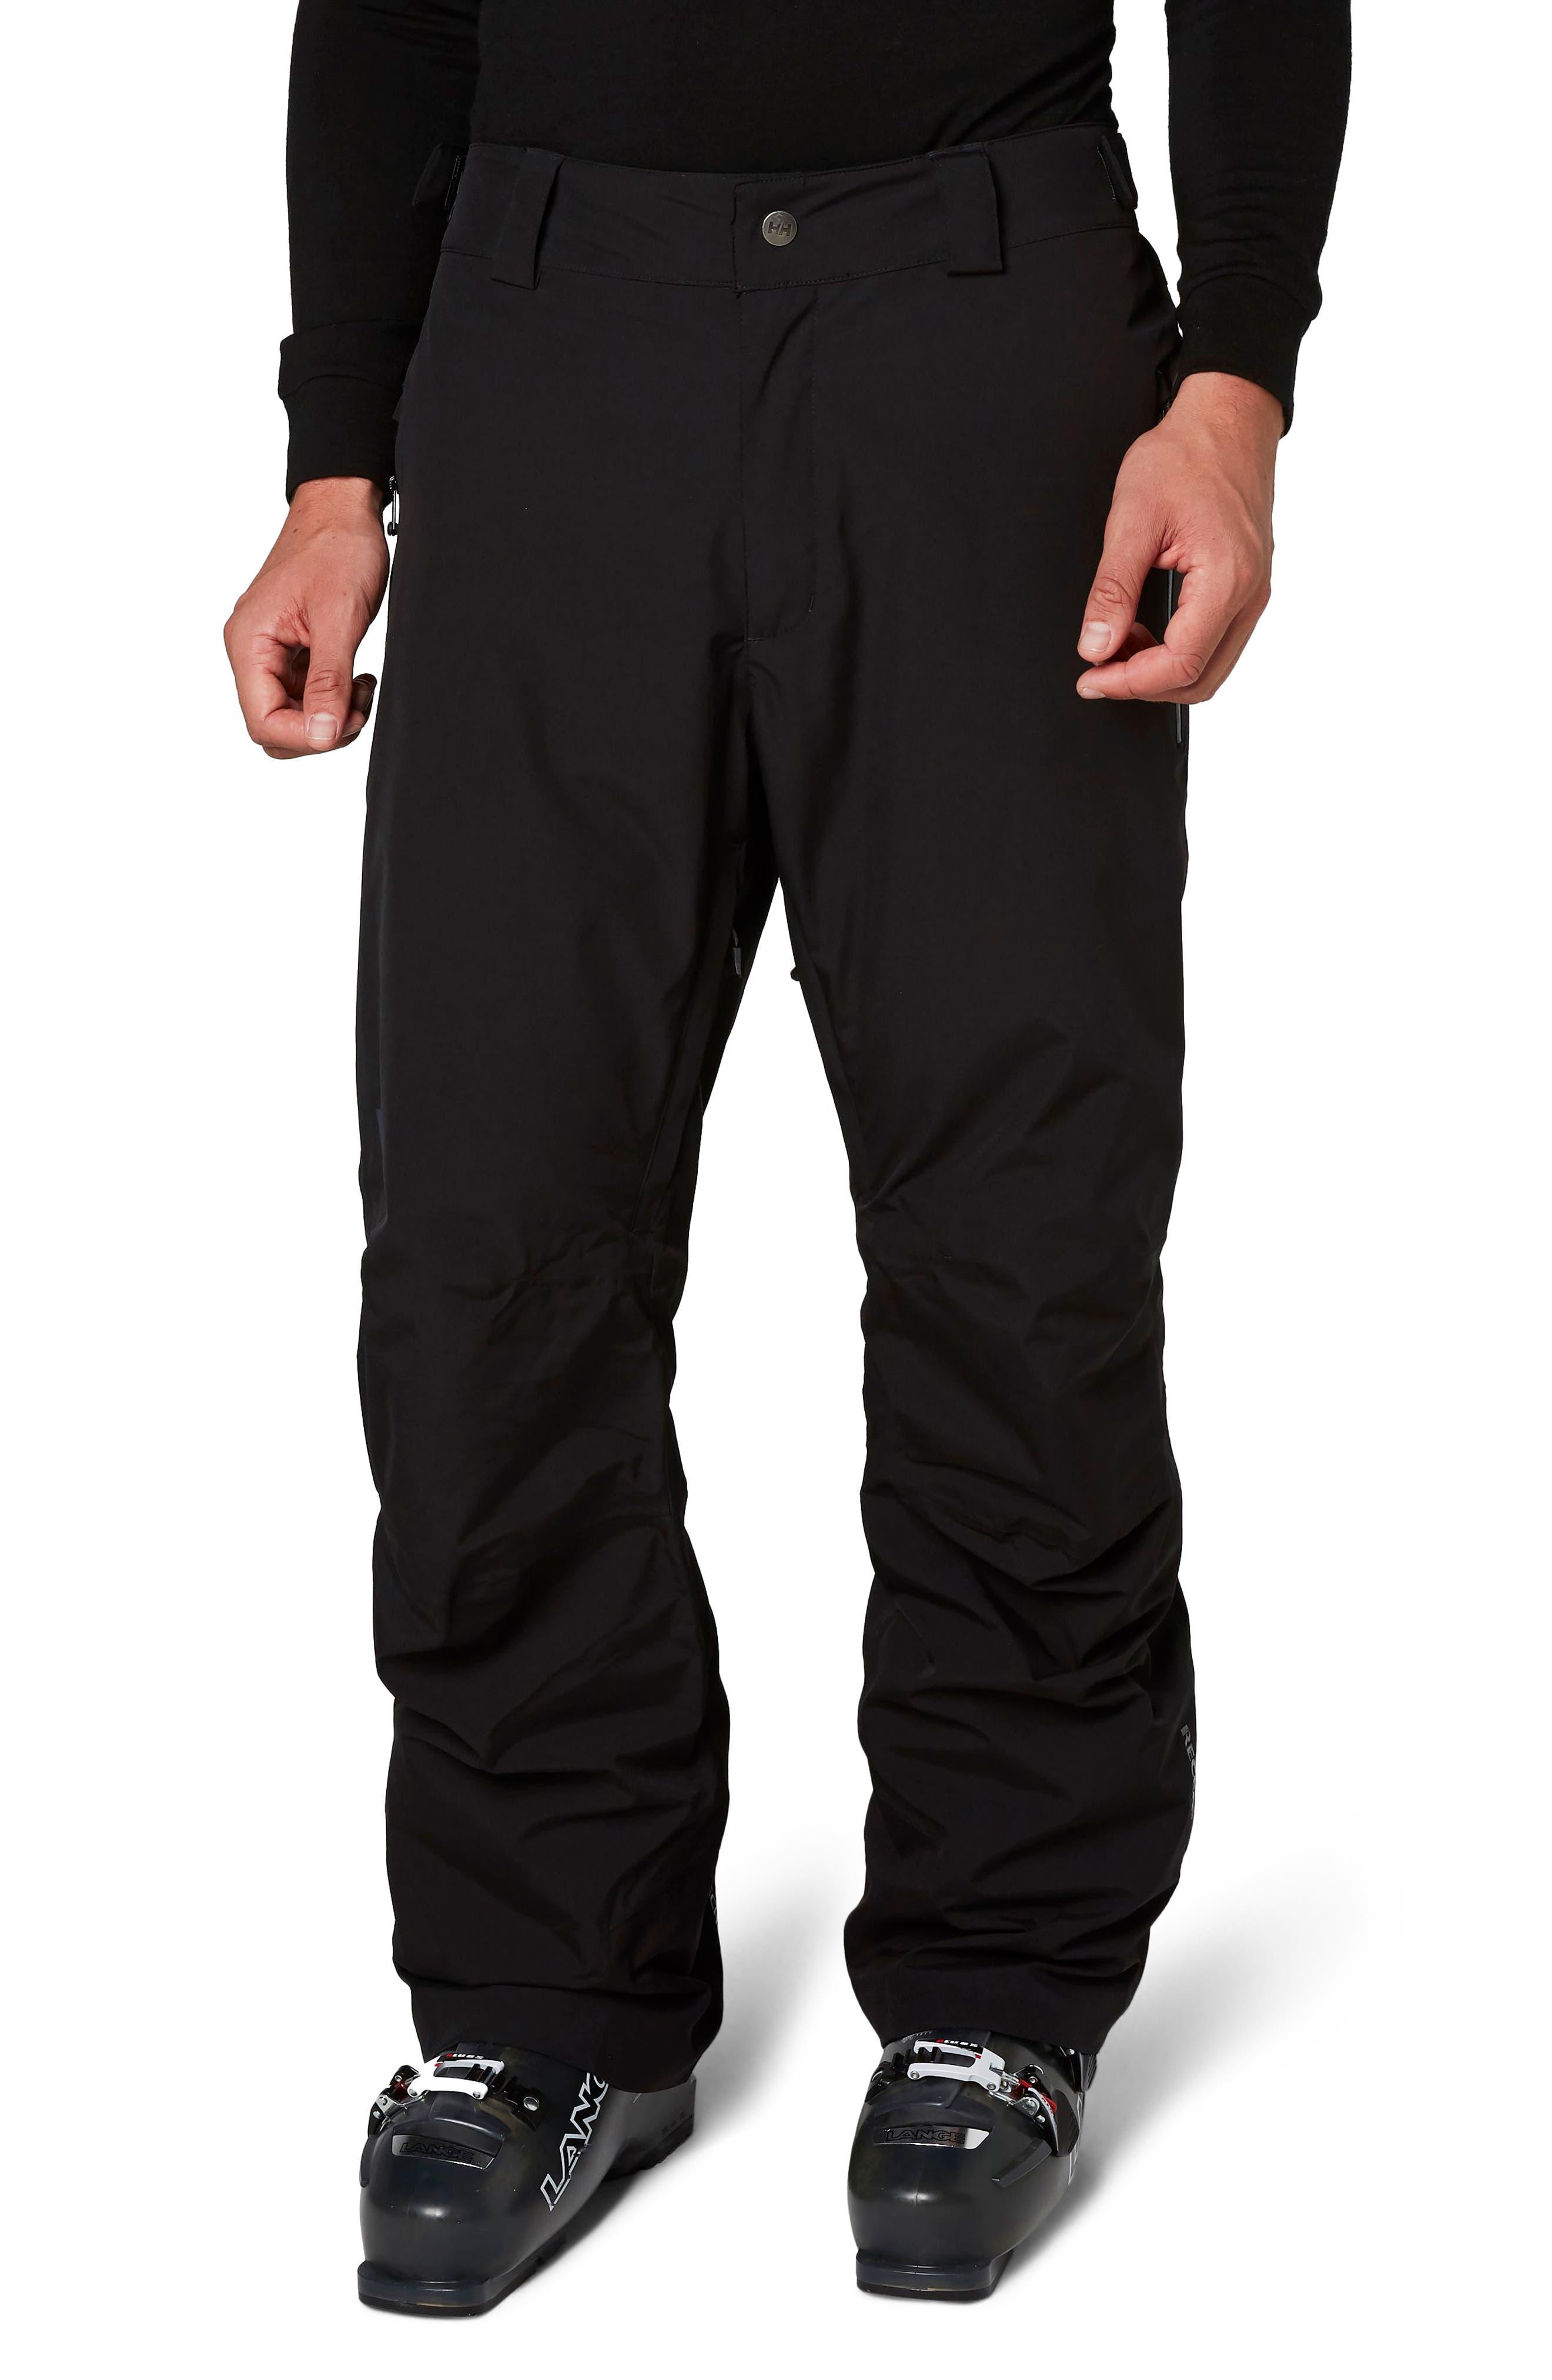 Main Image - Helly Hansen Legendary Waterproof PrimaLoft® Insulated Snow Pants